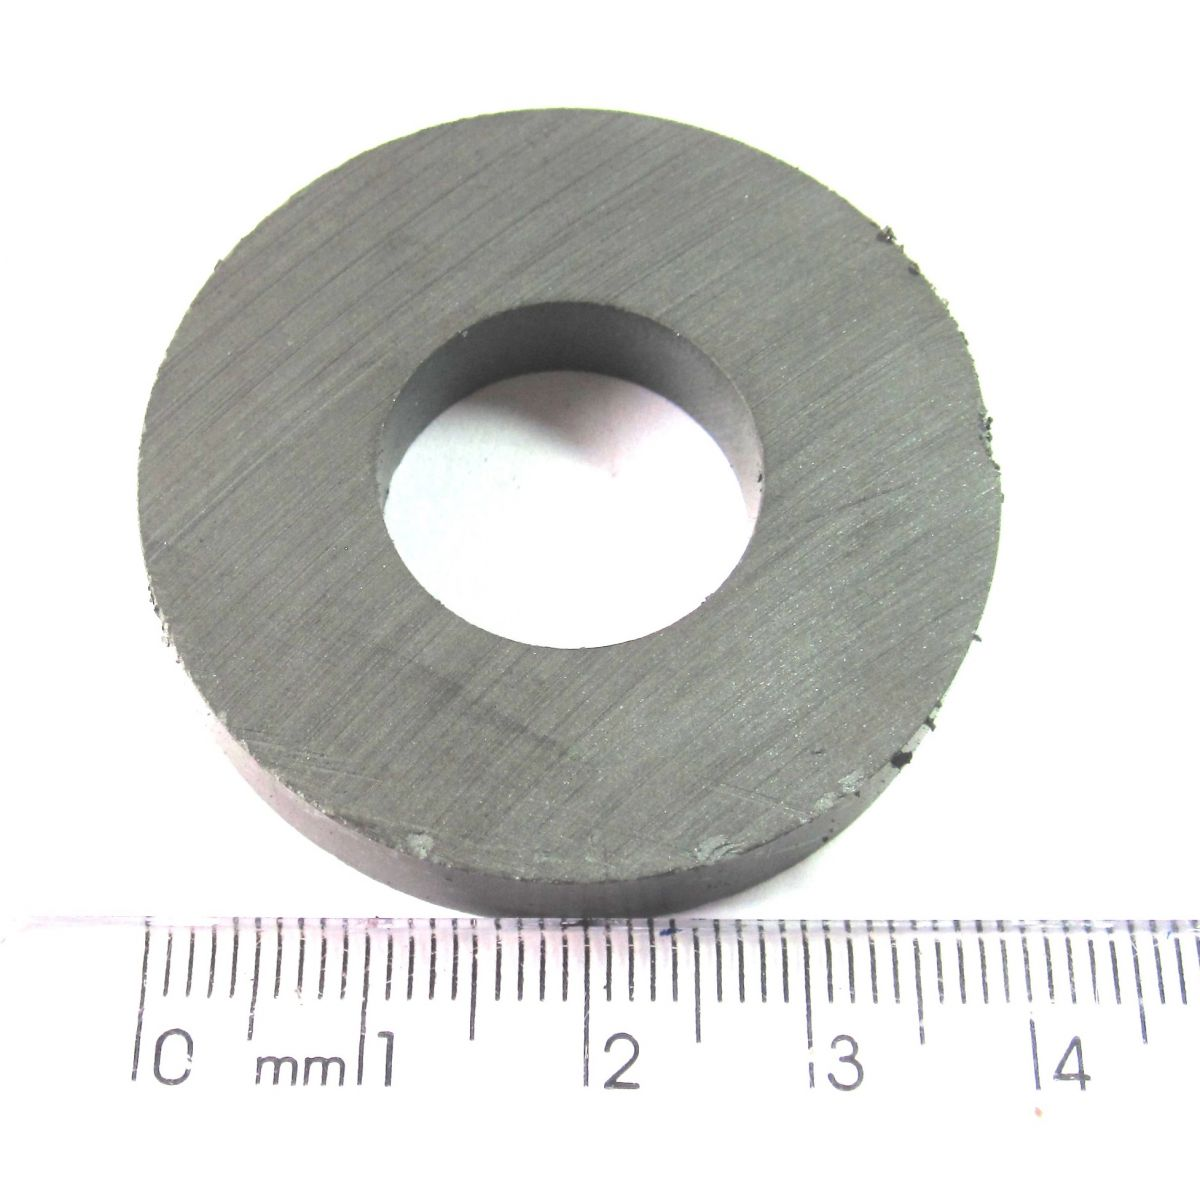 Imã de Ferrite Anel (cerâmica) Y25 40x18x7 mm  - Polo Magnético